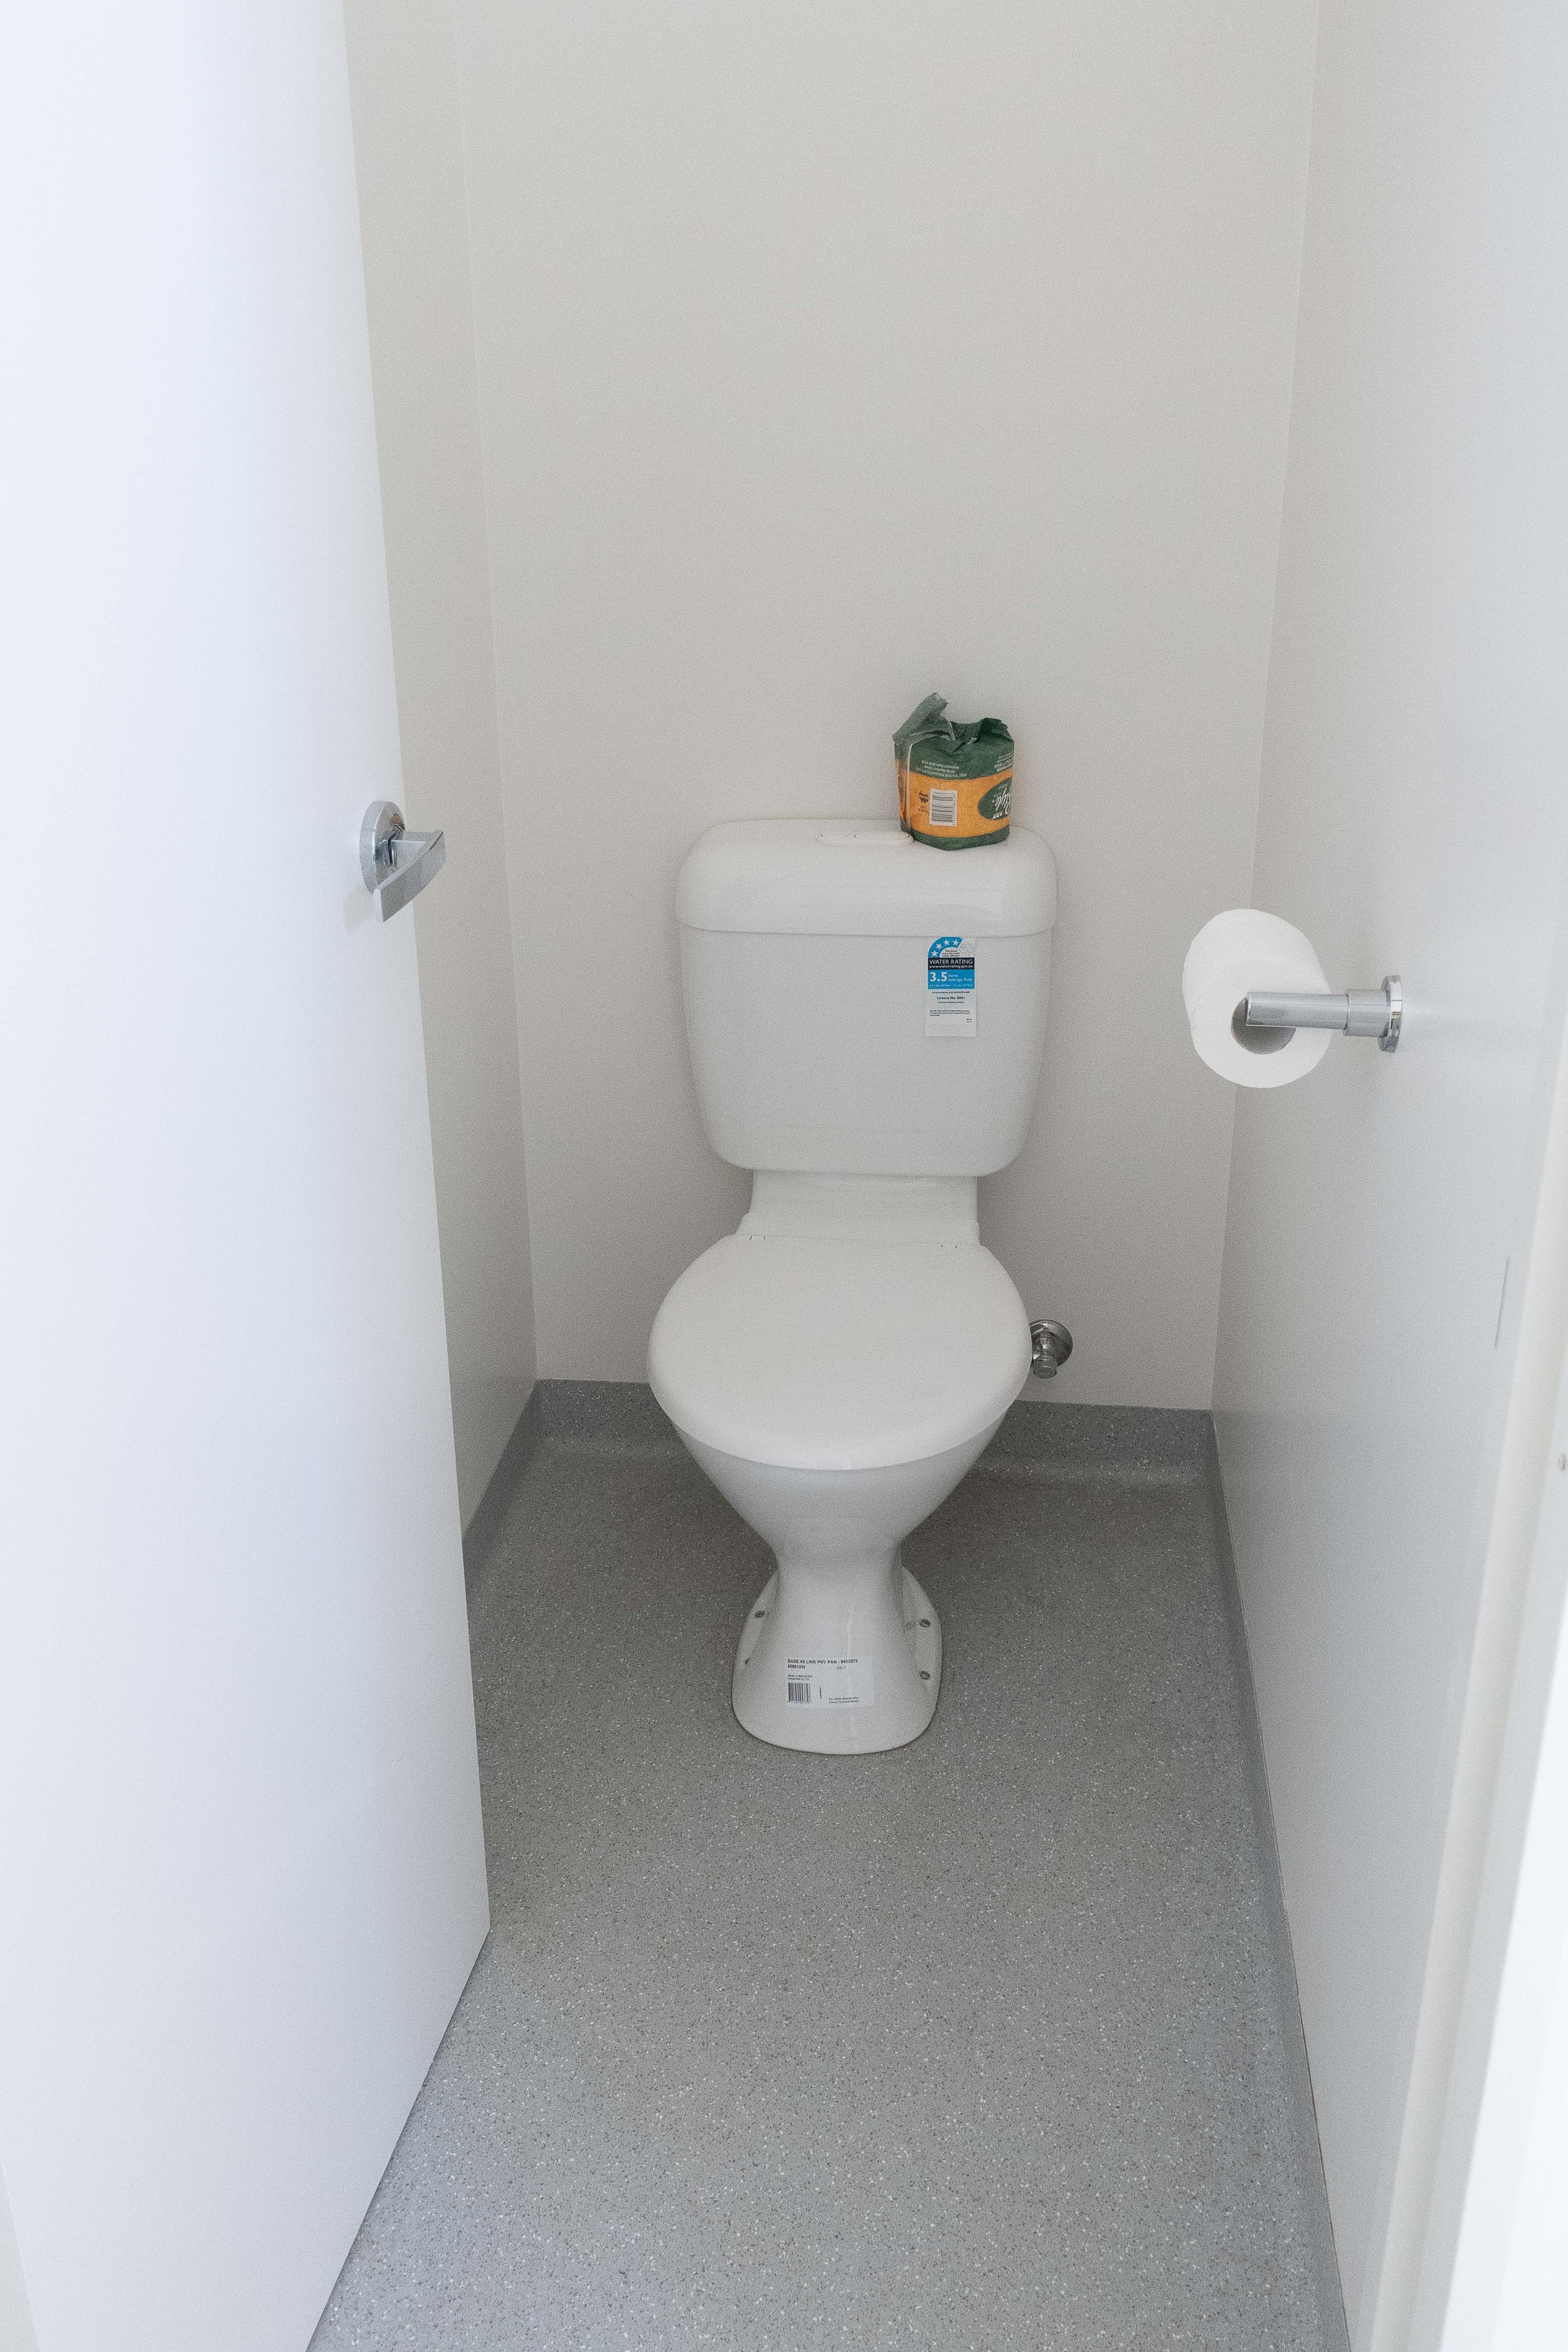 Toilets001.jpg